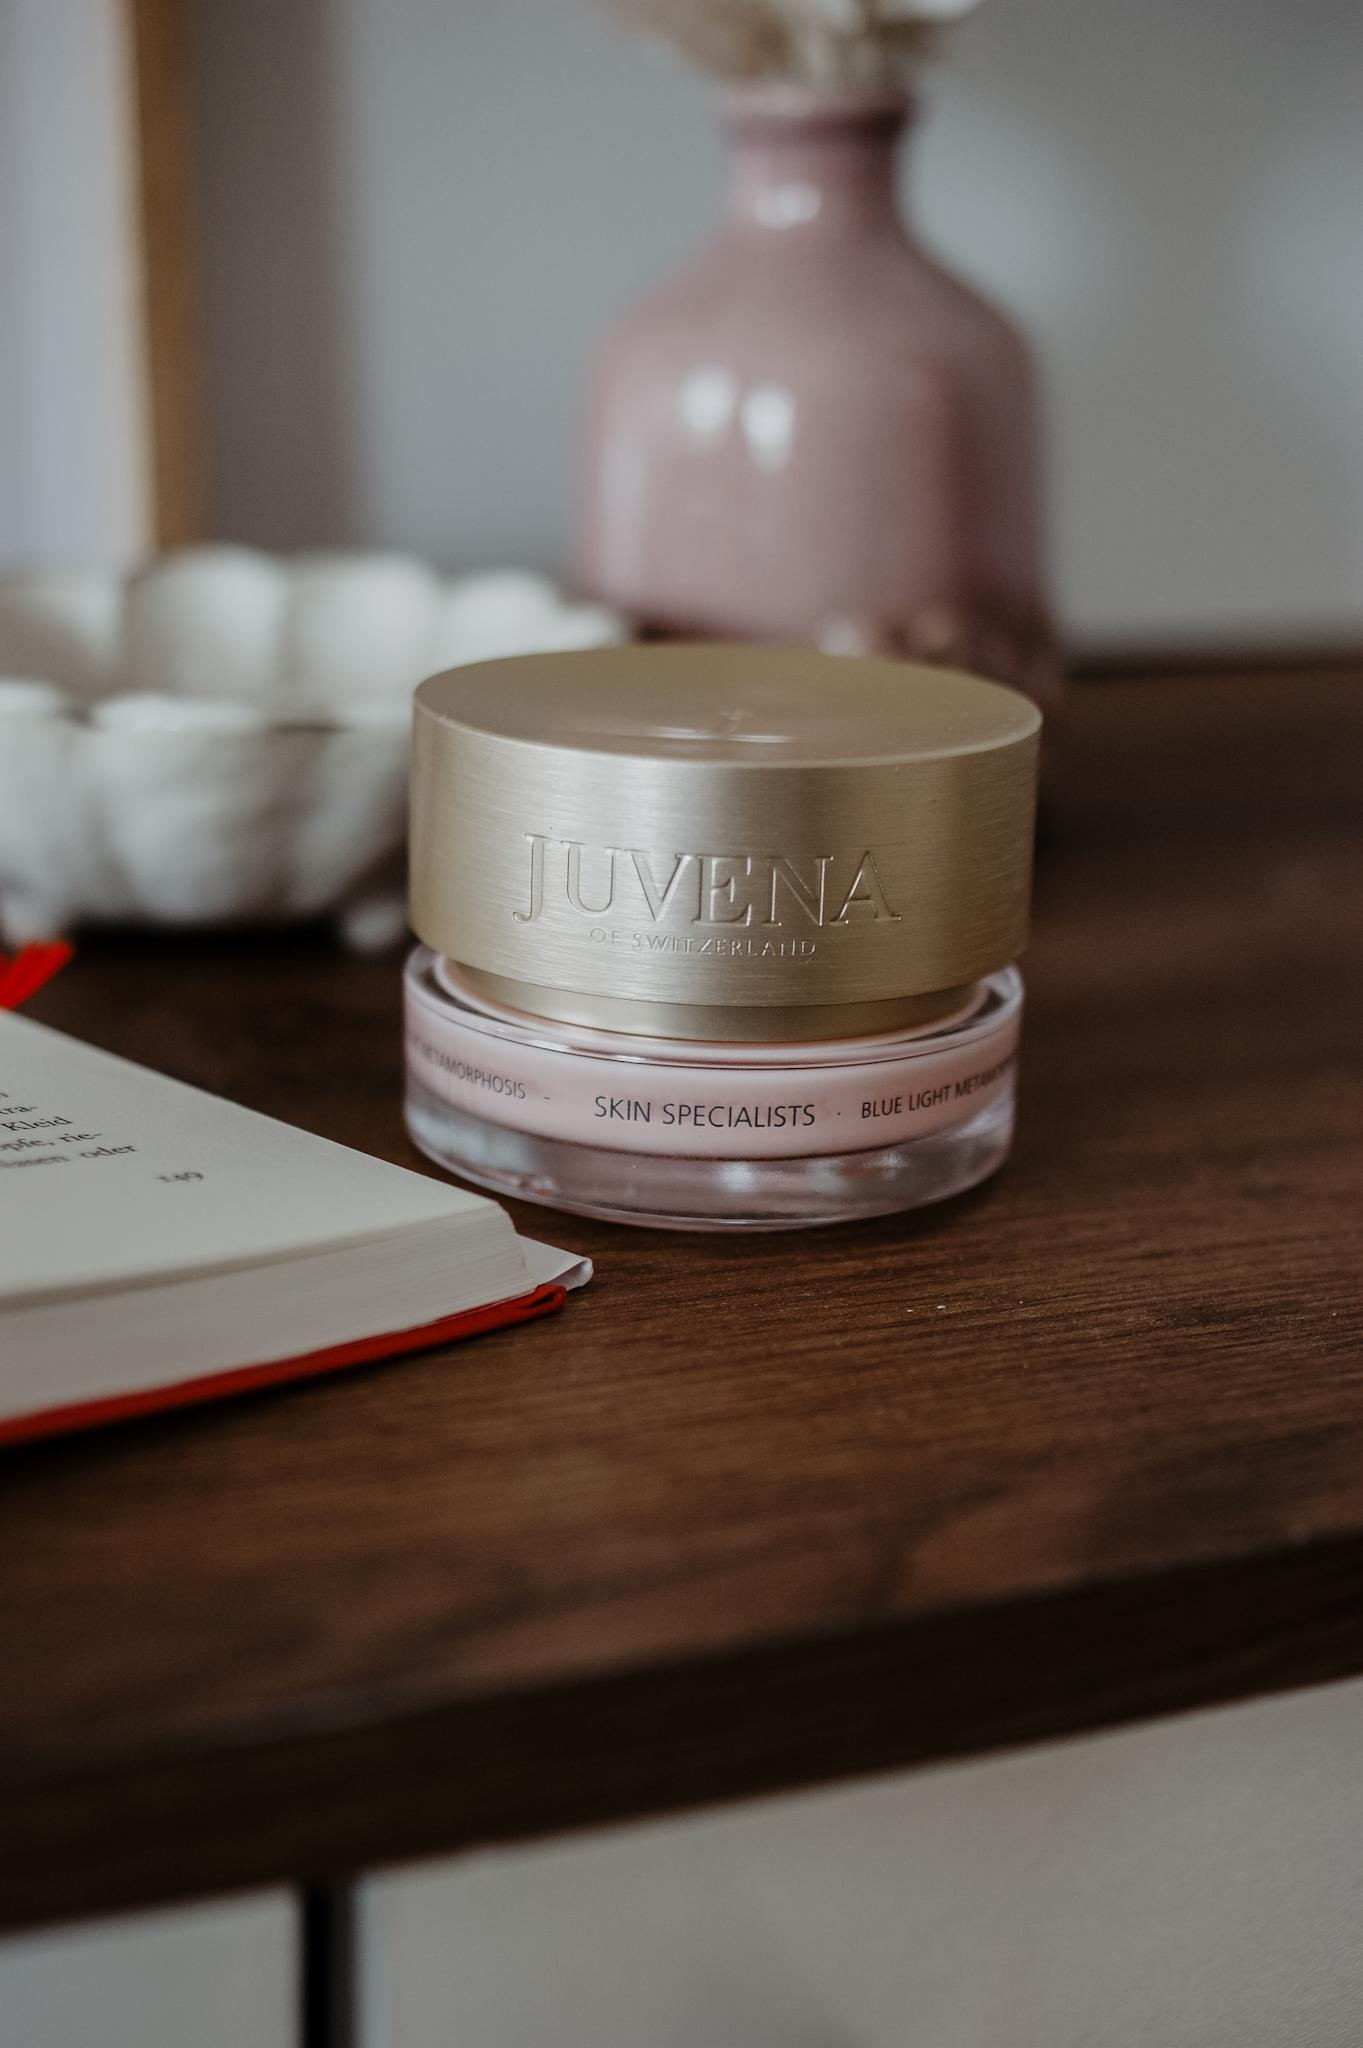 Juvena: Blue Light Metamorphosis Cream und Serum